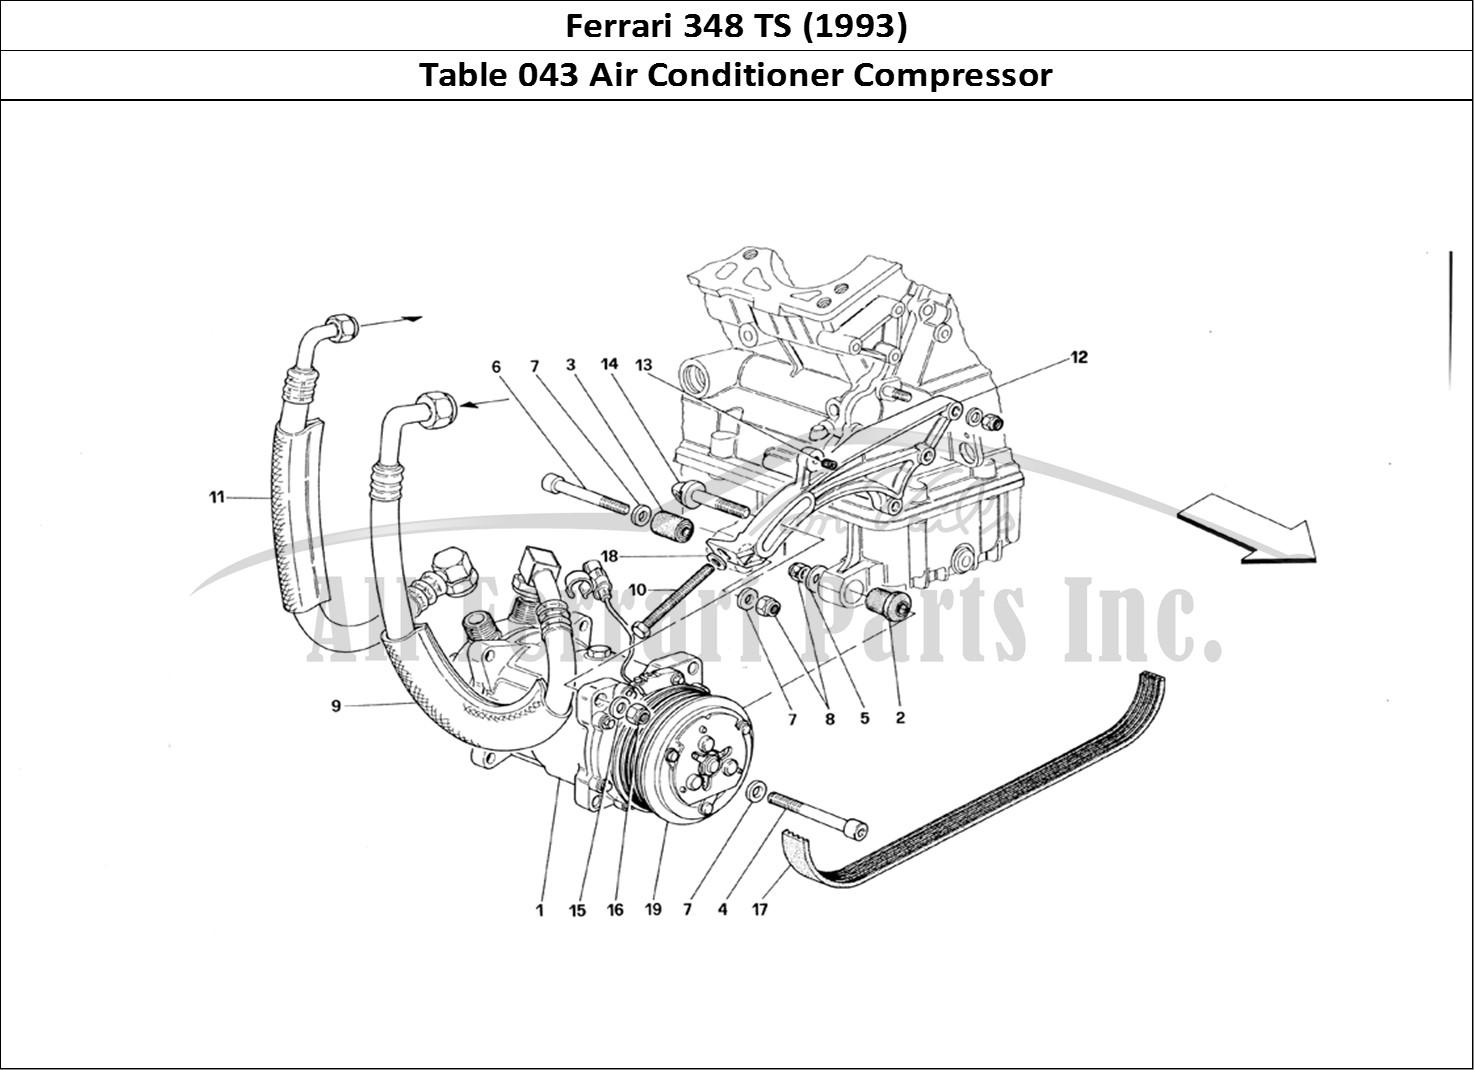 buy original ferrari 348 ts  1993  043 air conditioner